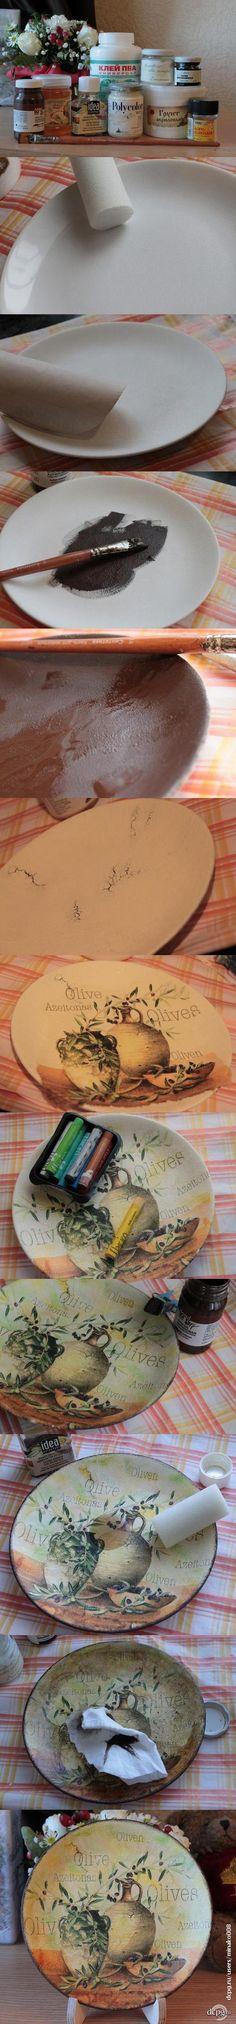 "Декупаж - Сайт любителей декупажа - DCPG.RU | Декорируем тарелочку ""Olives"""